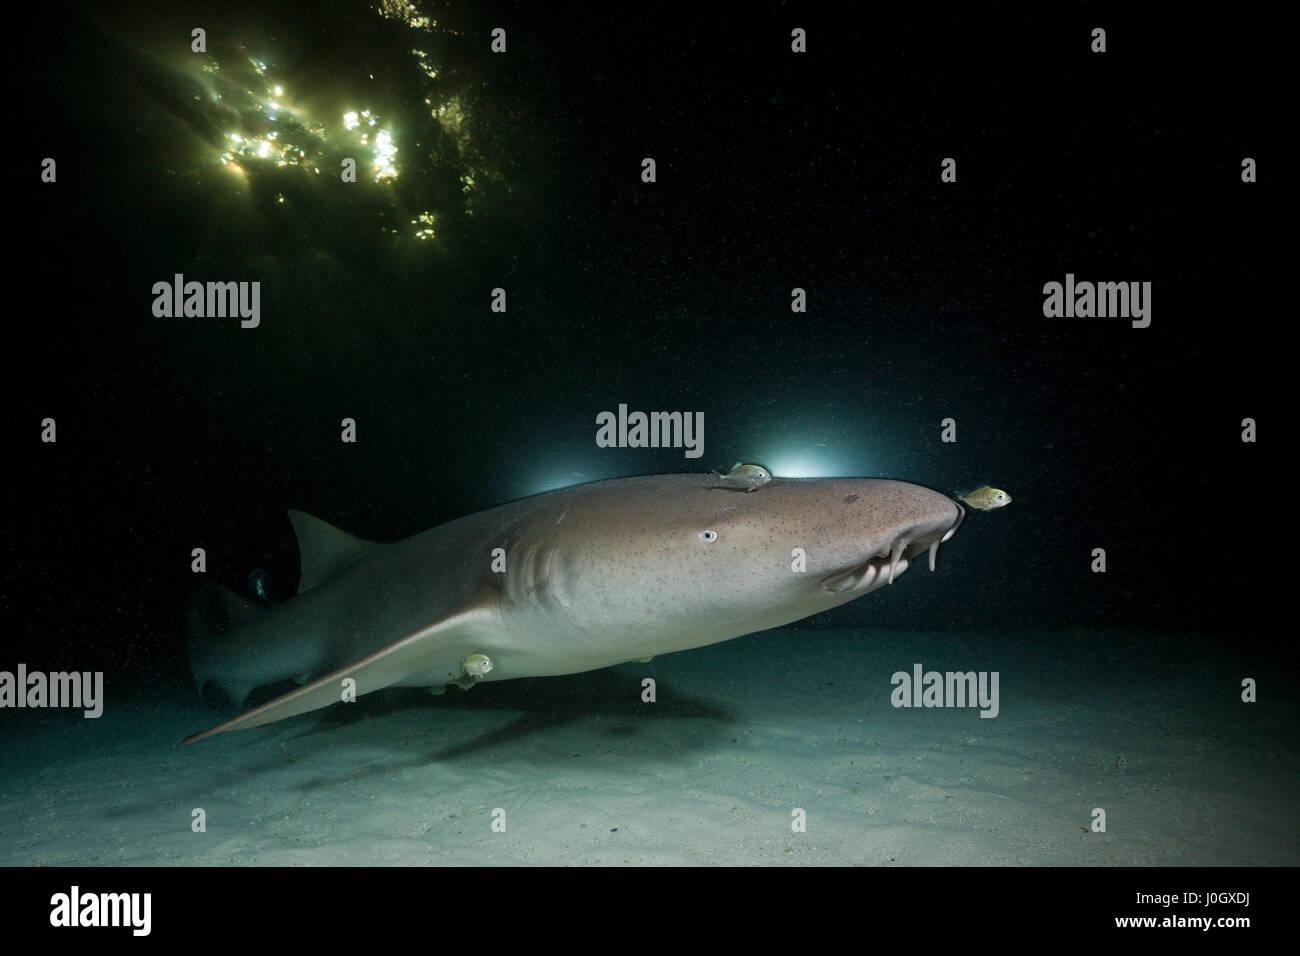 Nurse Shark at Night, Nebrius ferrugineus, Felidhu Atoll, Maldives - Stock Image